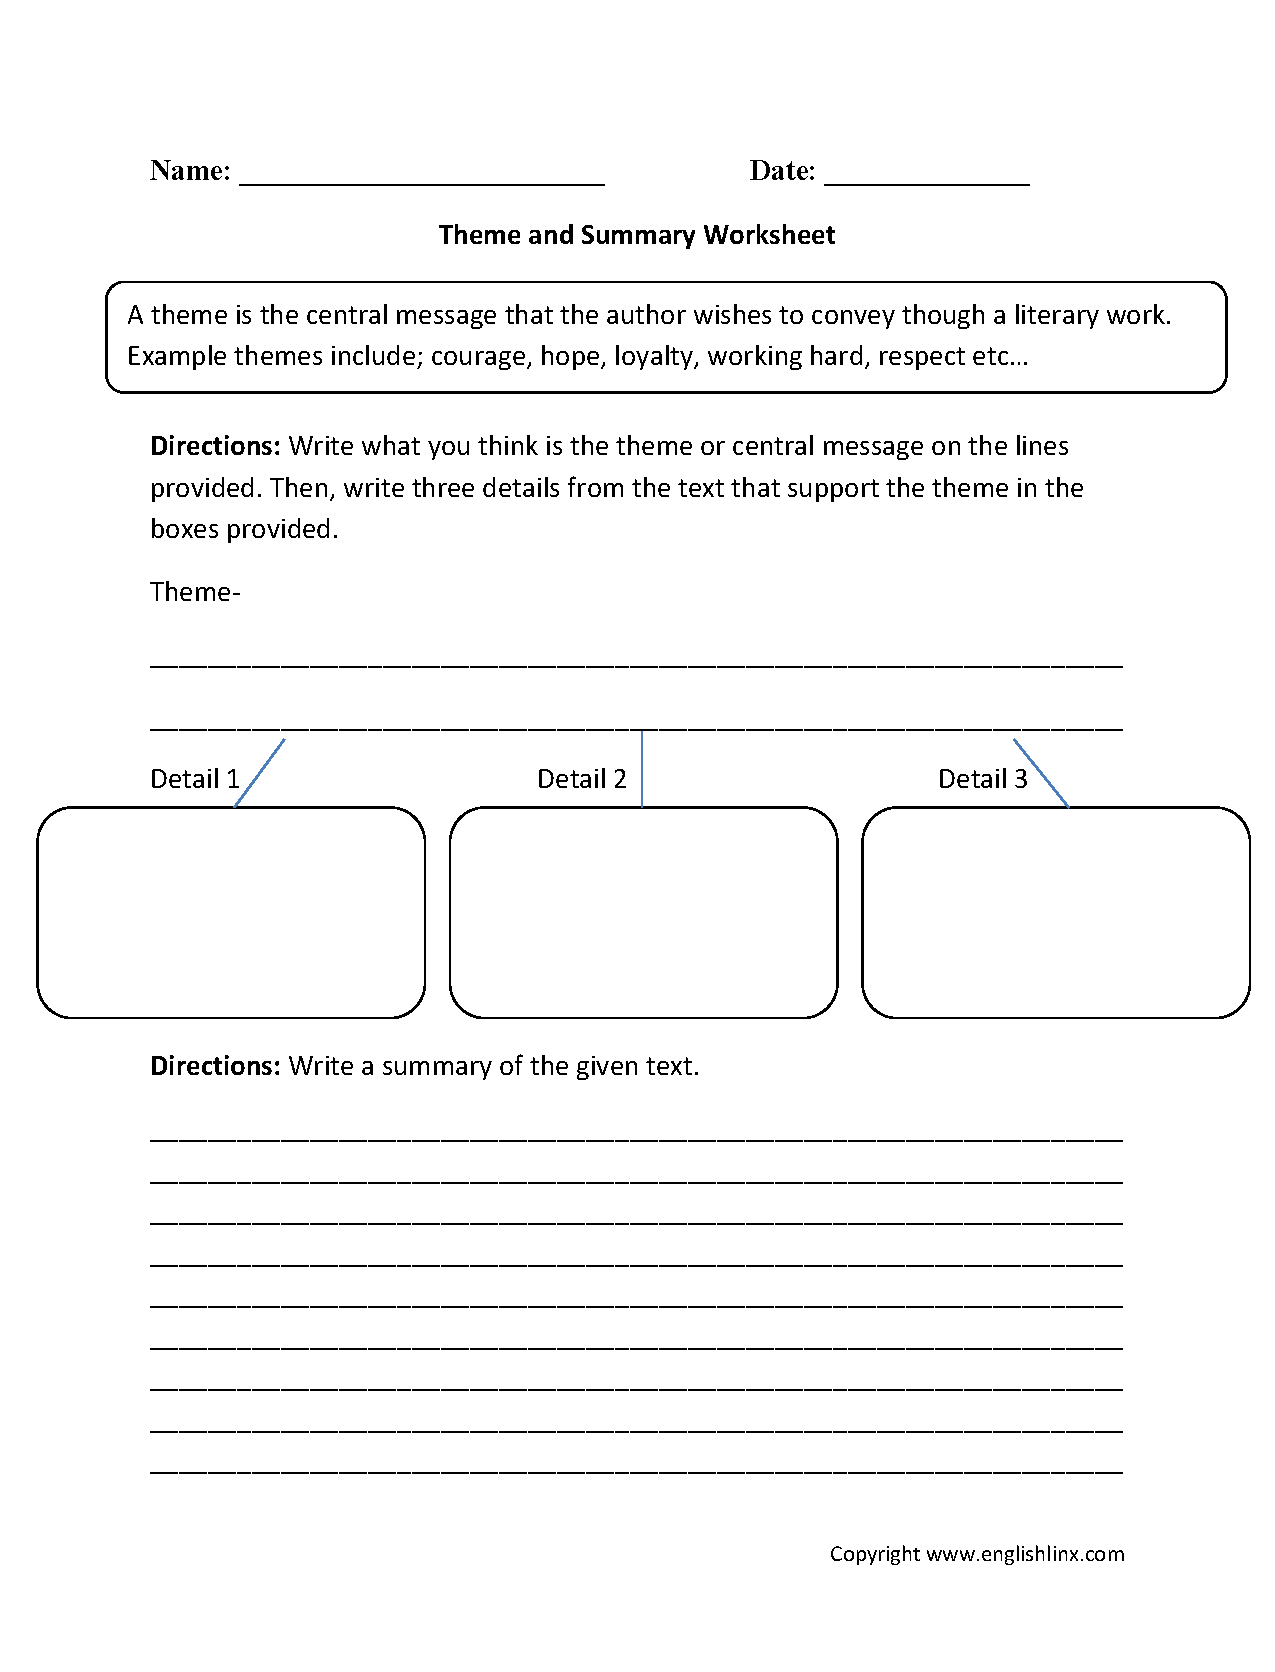 medium resolution of Theme Worksheets   School worksheets